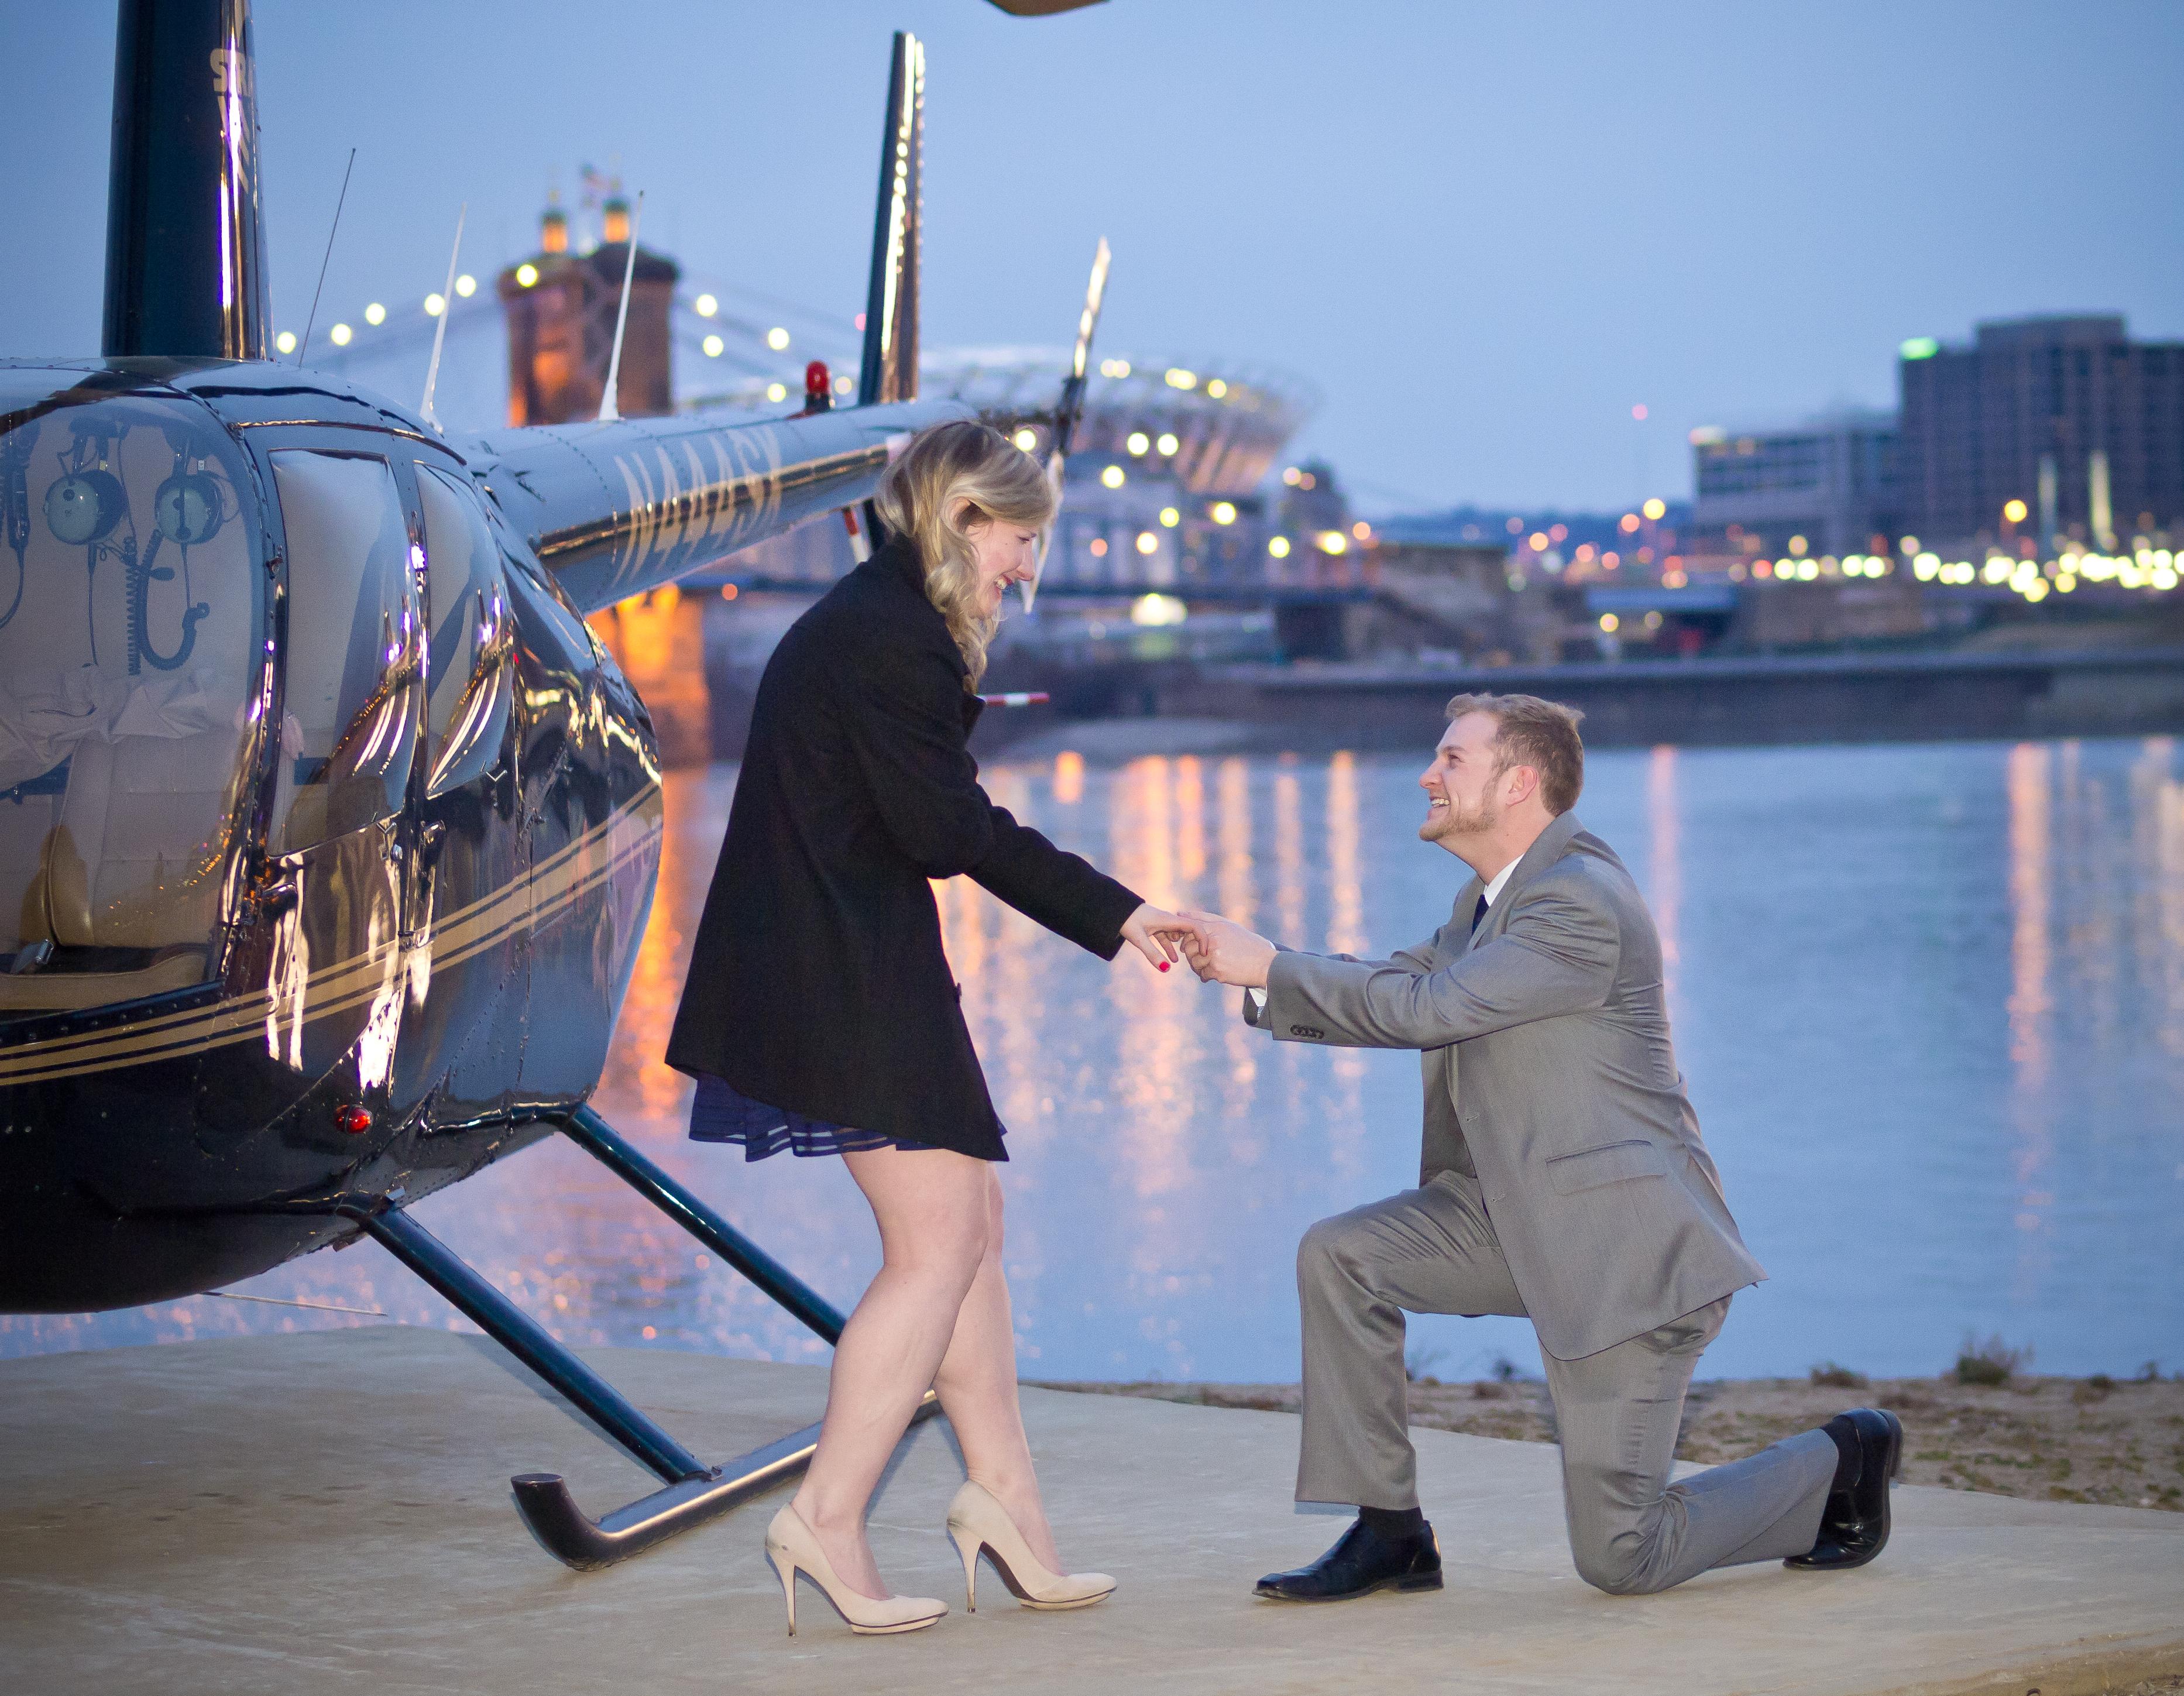 Image 2 of A Very Creative Marriage Proposal in Cincinnati